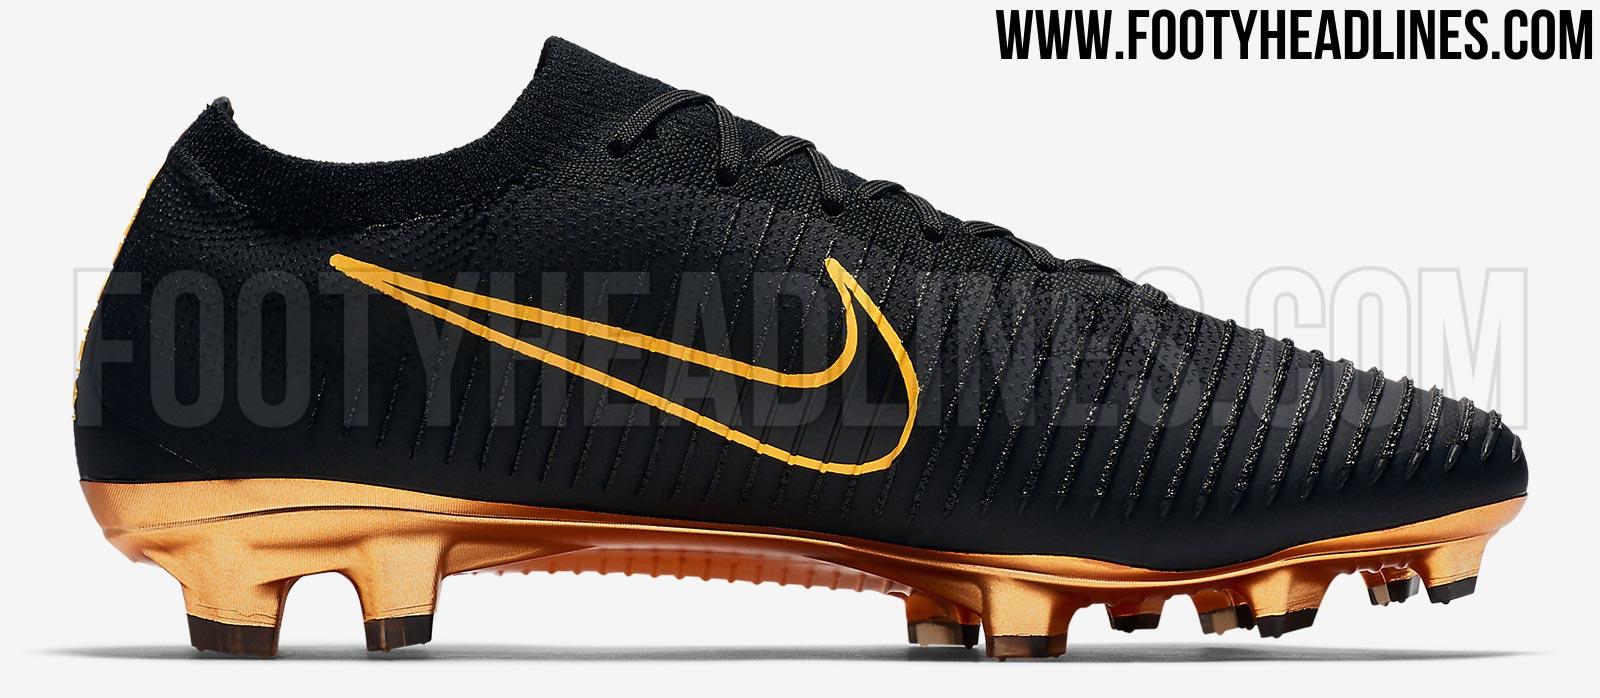 Flyknit Des Métallique Or Noir Ultra Sortie Nike Chaussures WgfFZFp